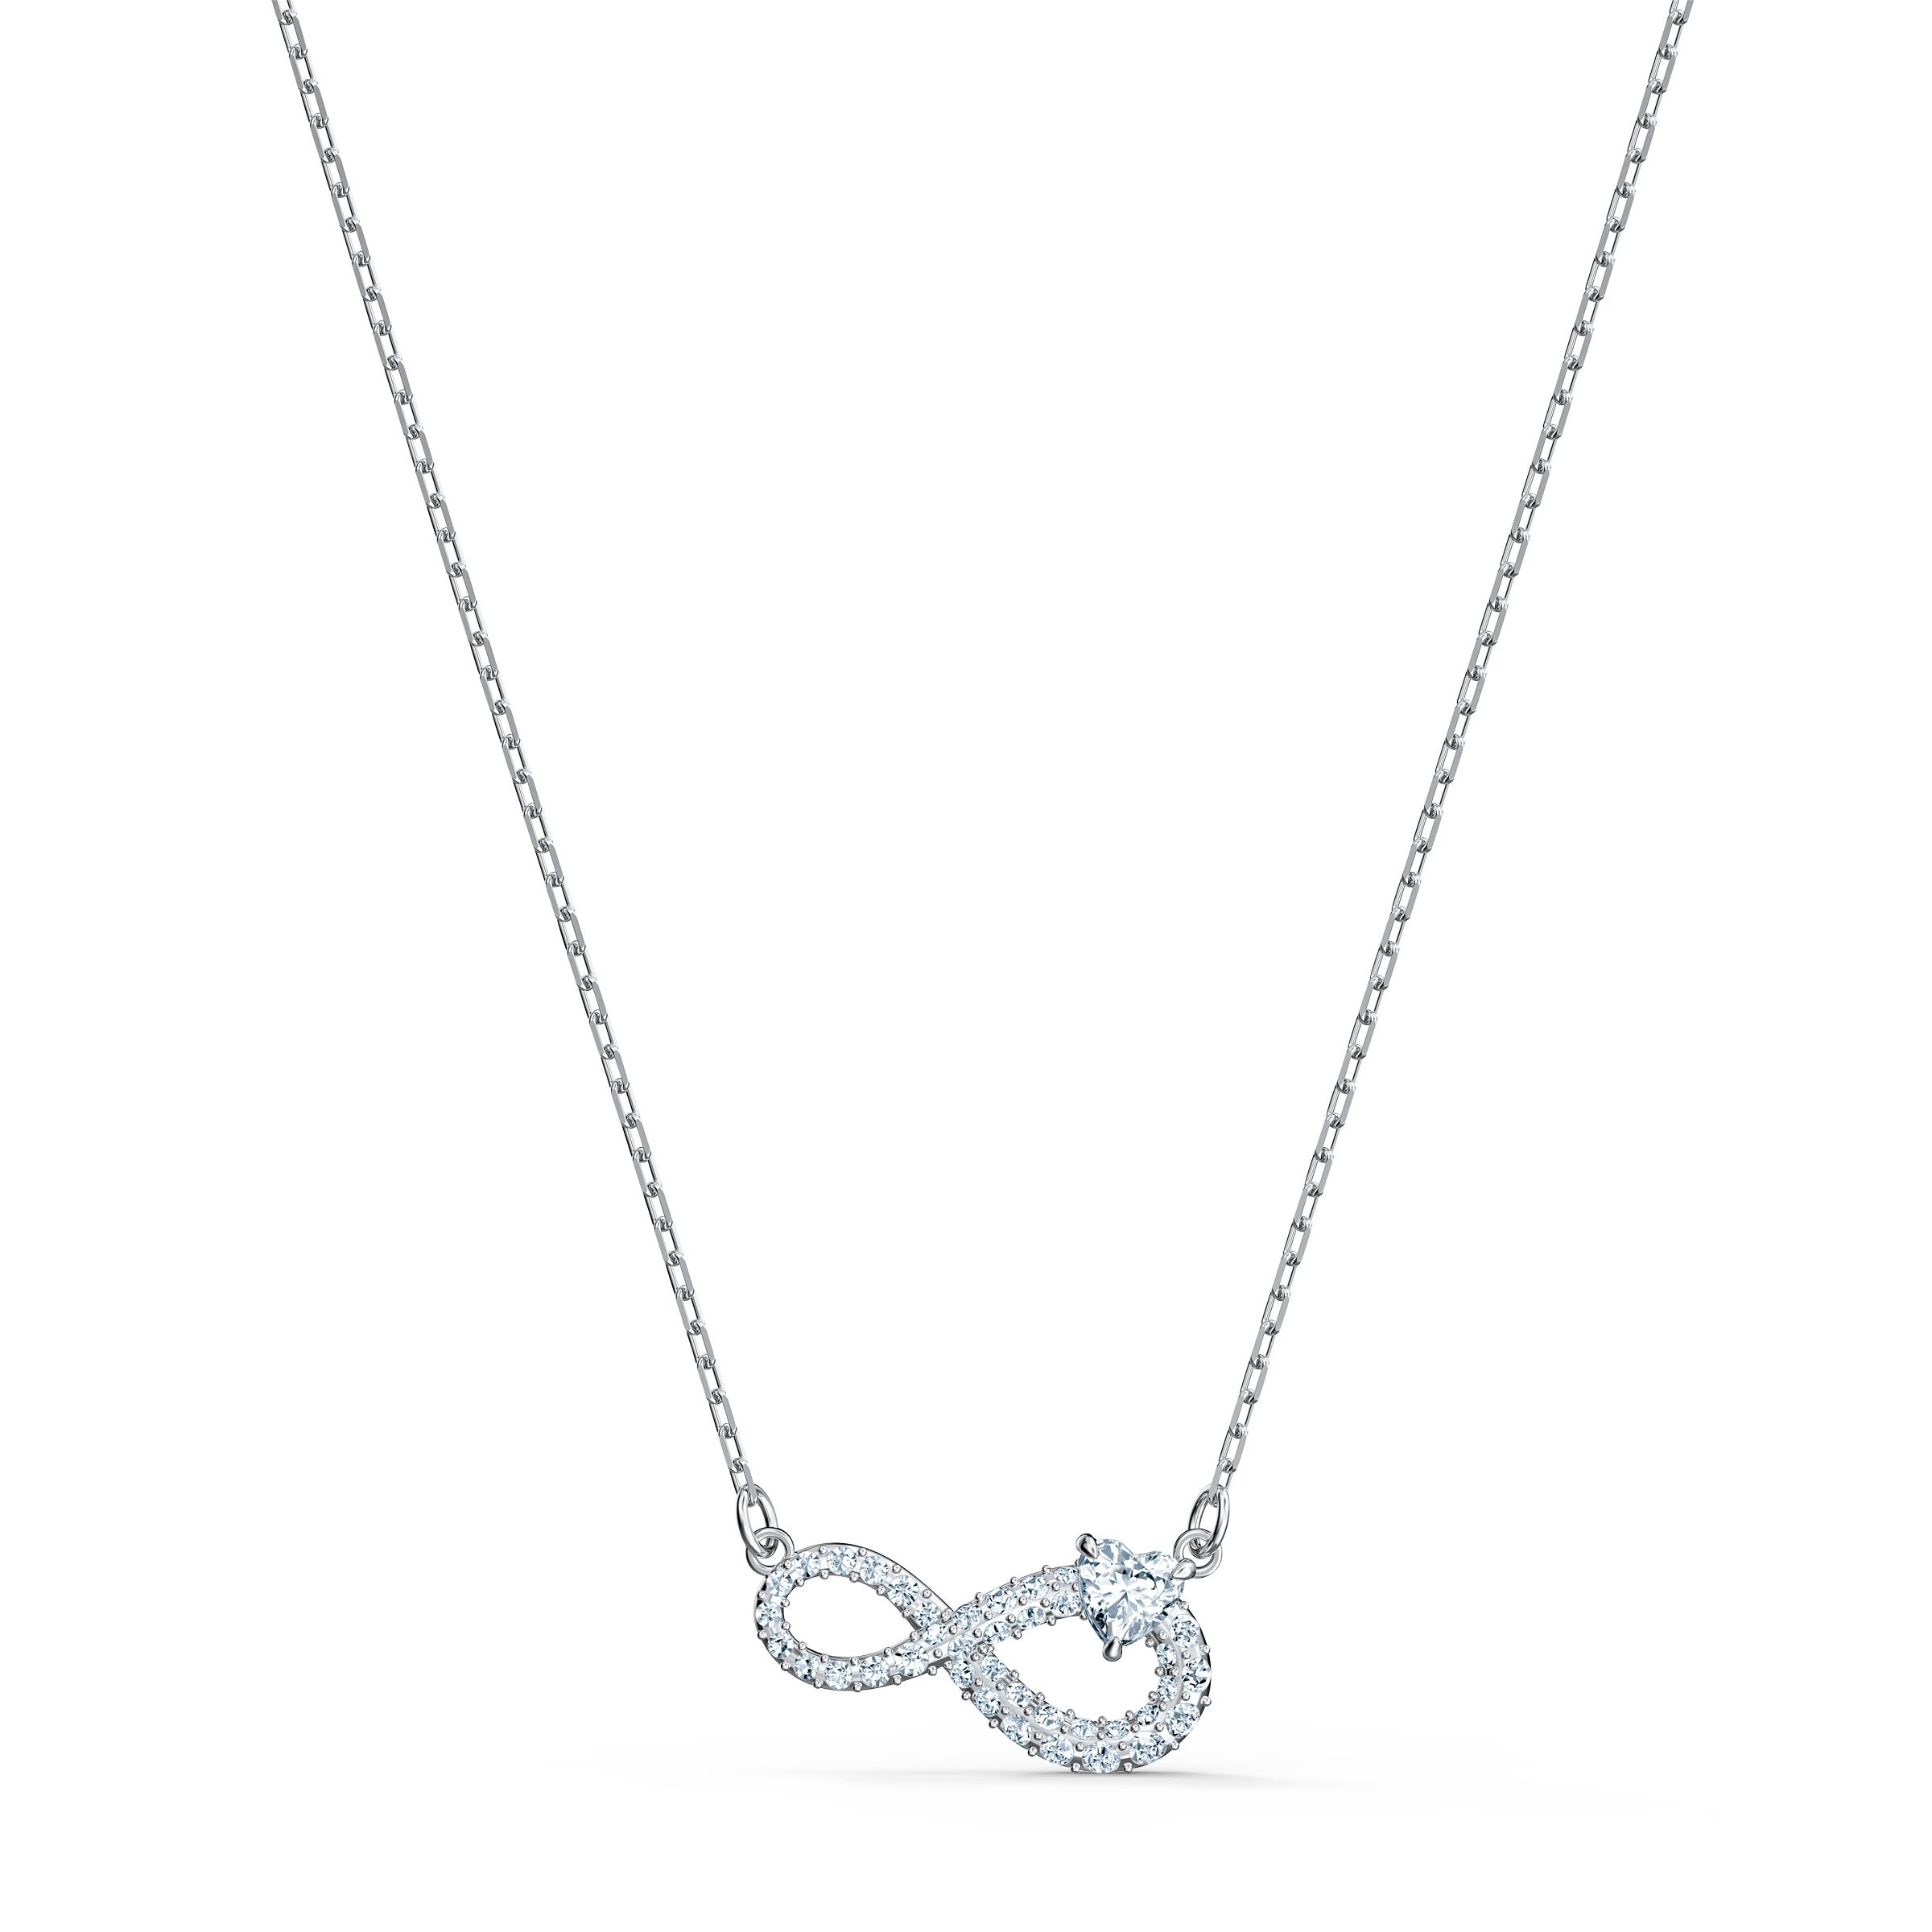 Collier Swarovski Infinity, blanc, métal rhodié Swarovski